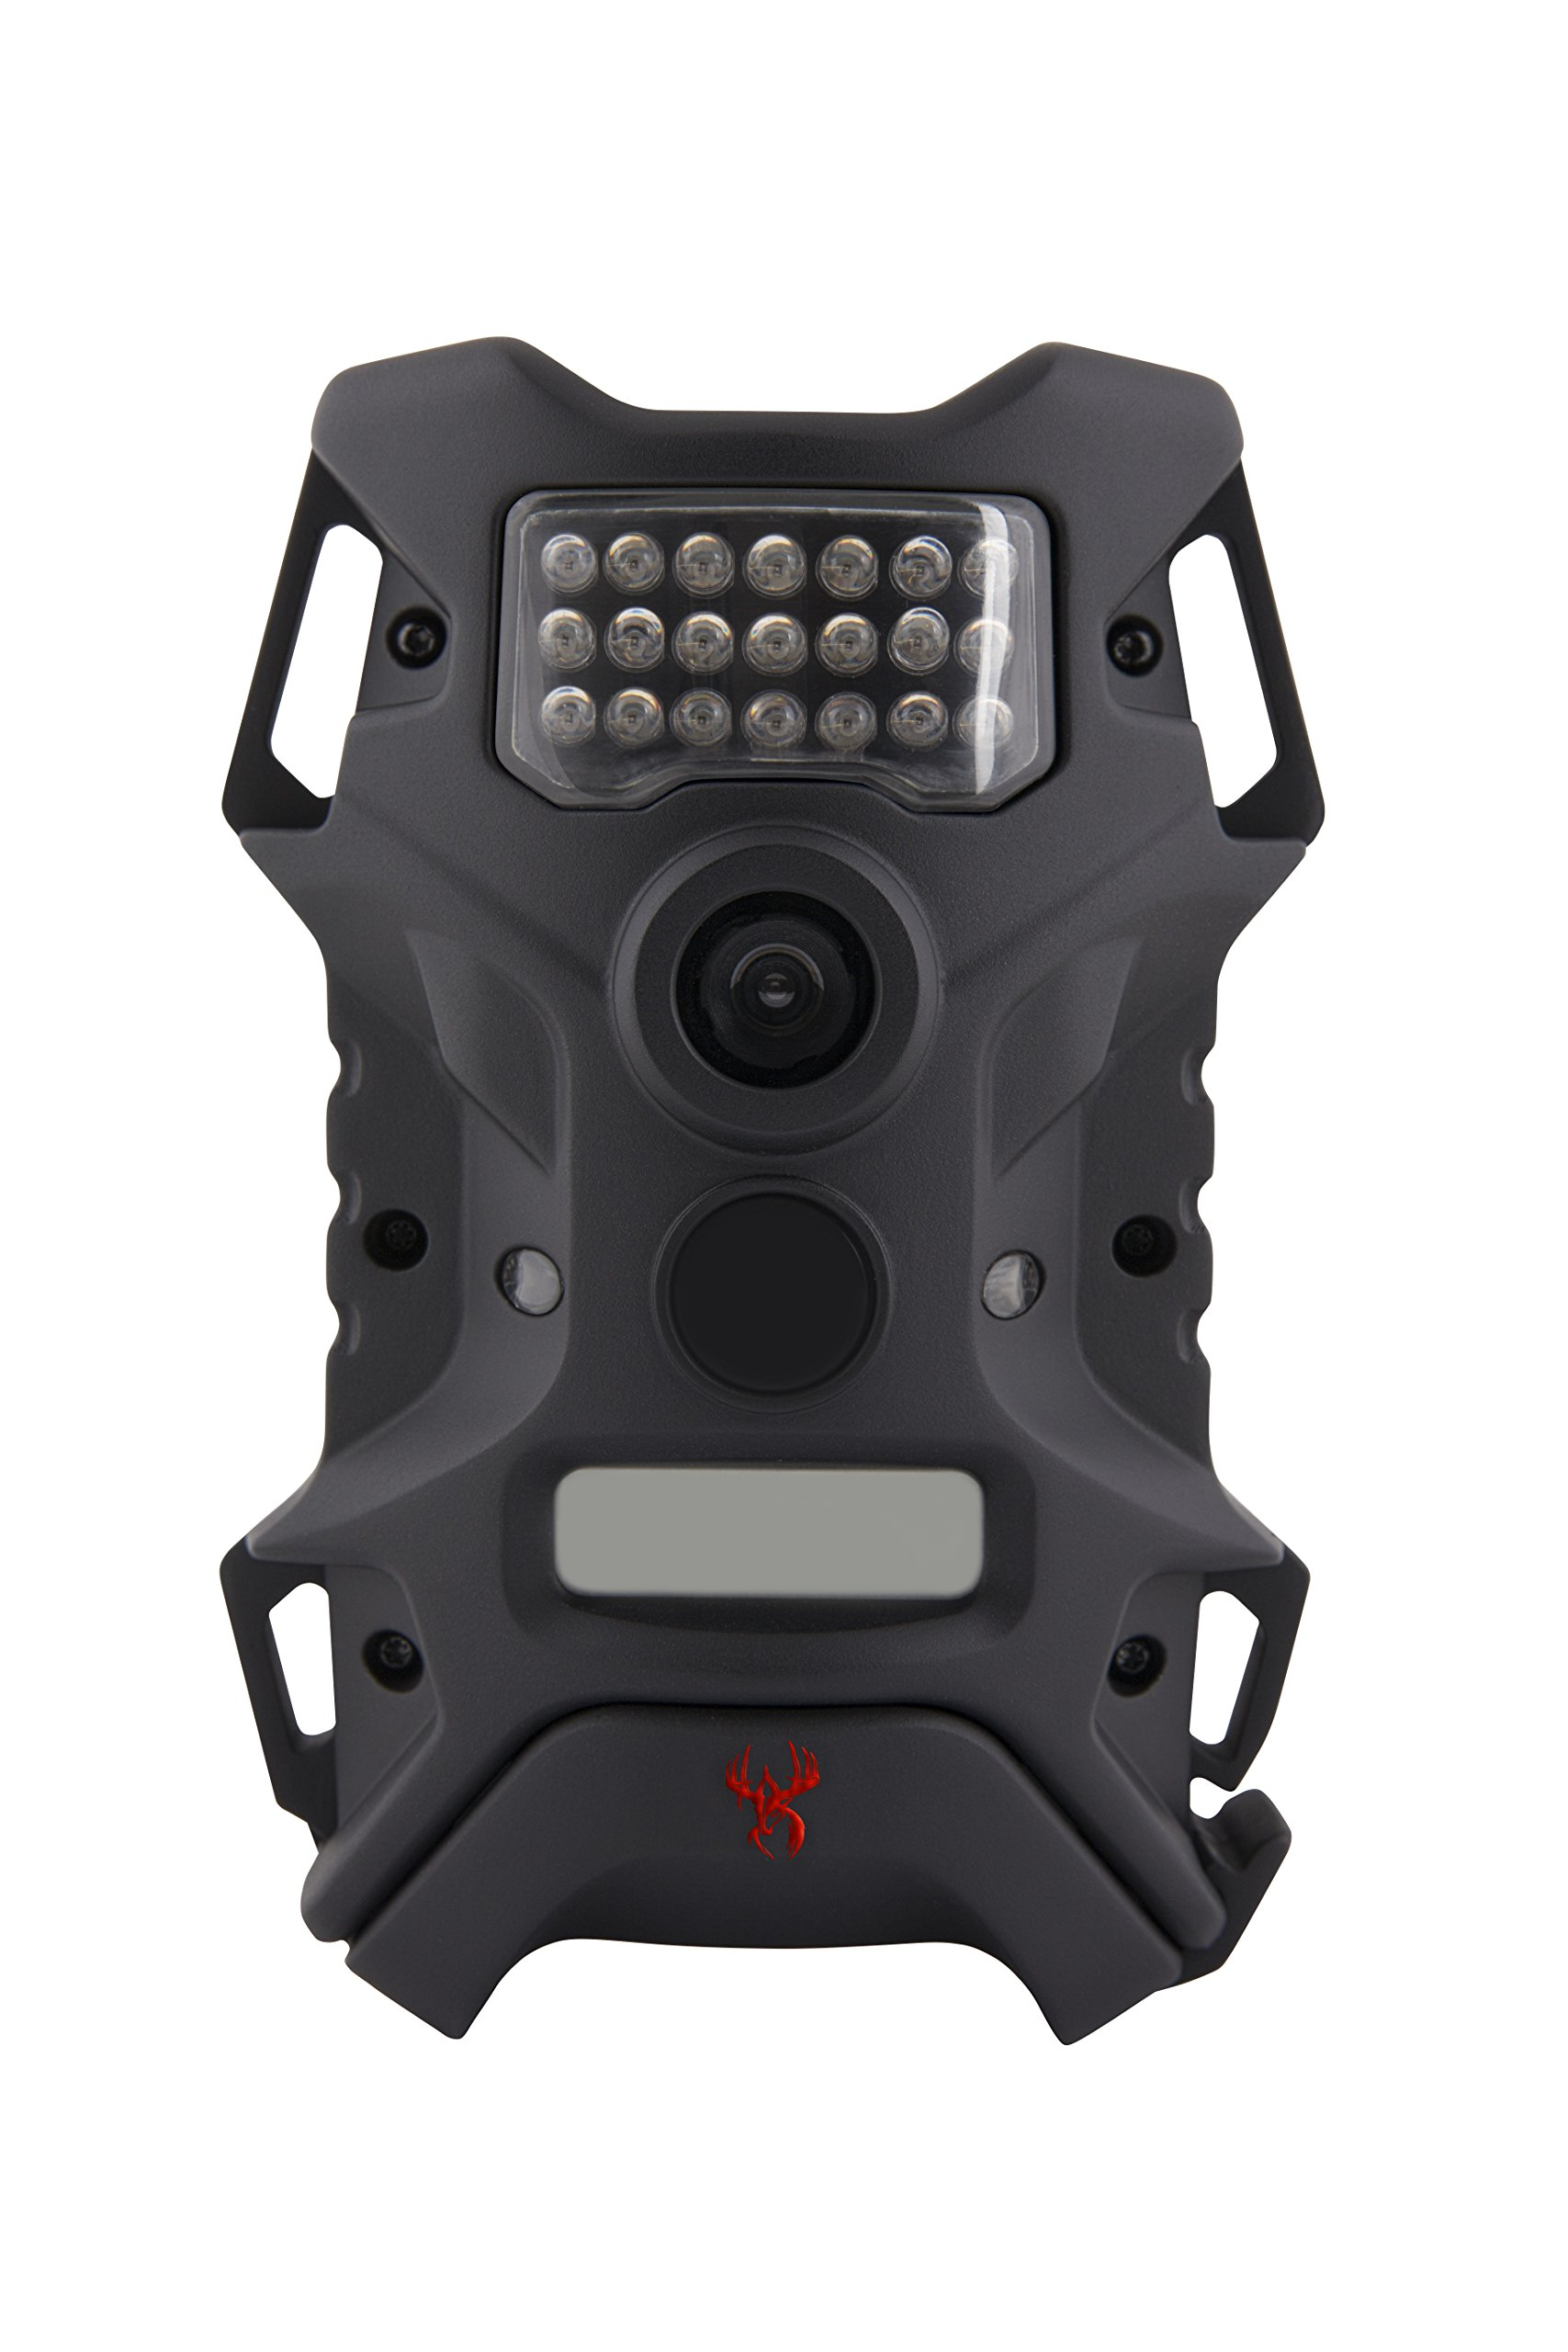 Wildgame Innovations TX10i1 8 Extreme Camera